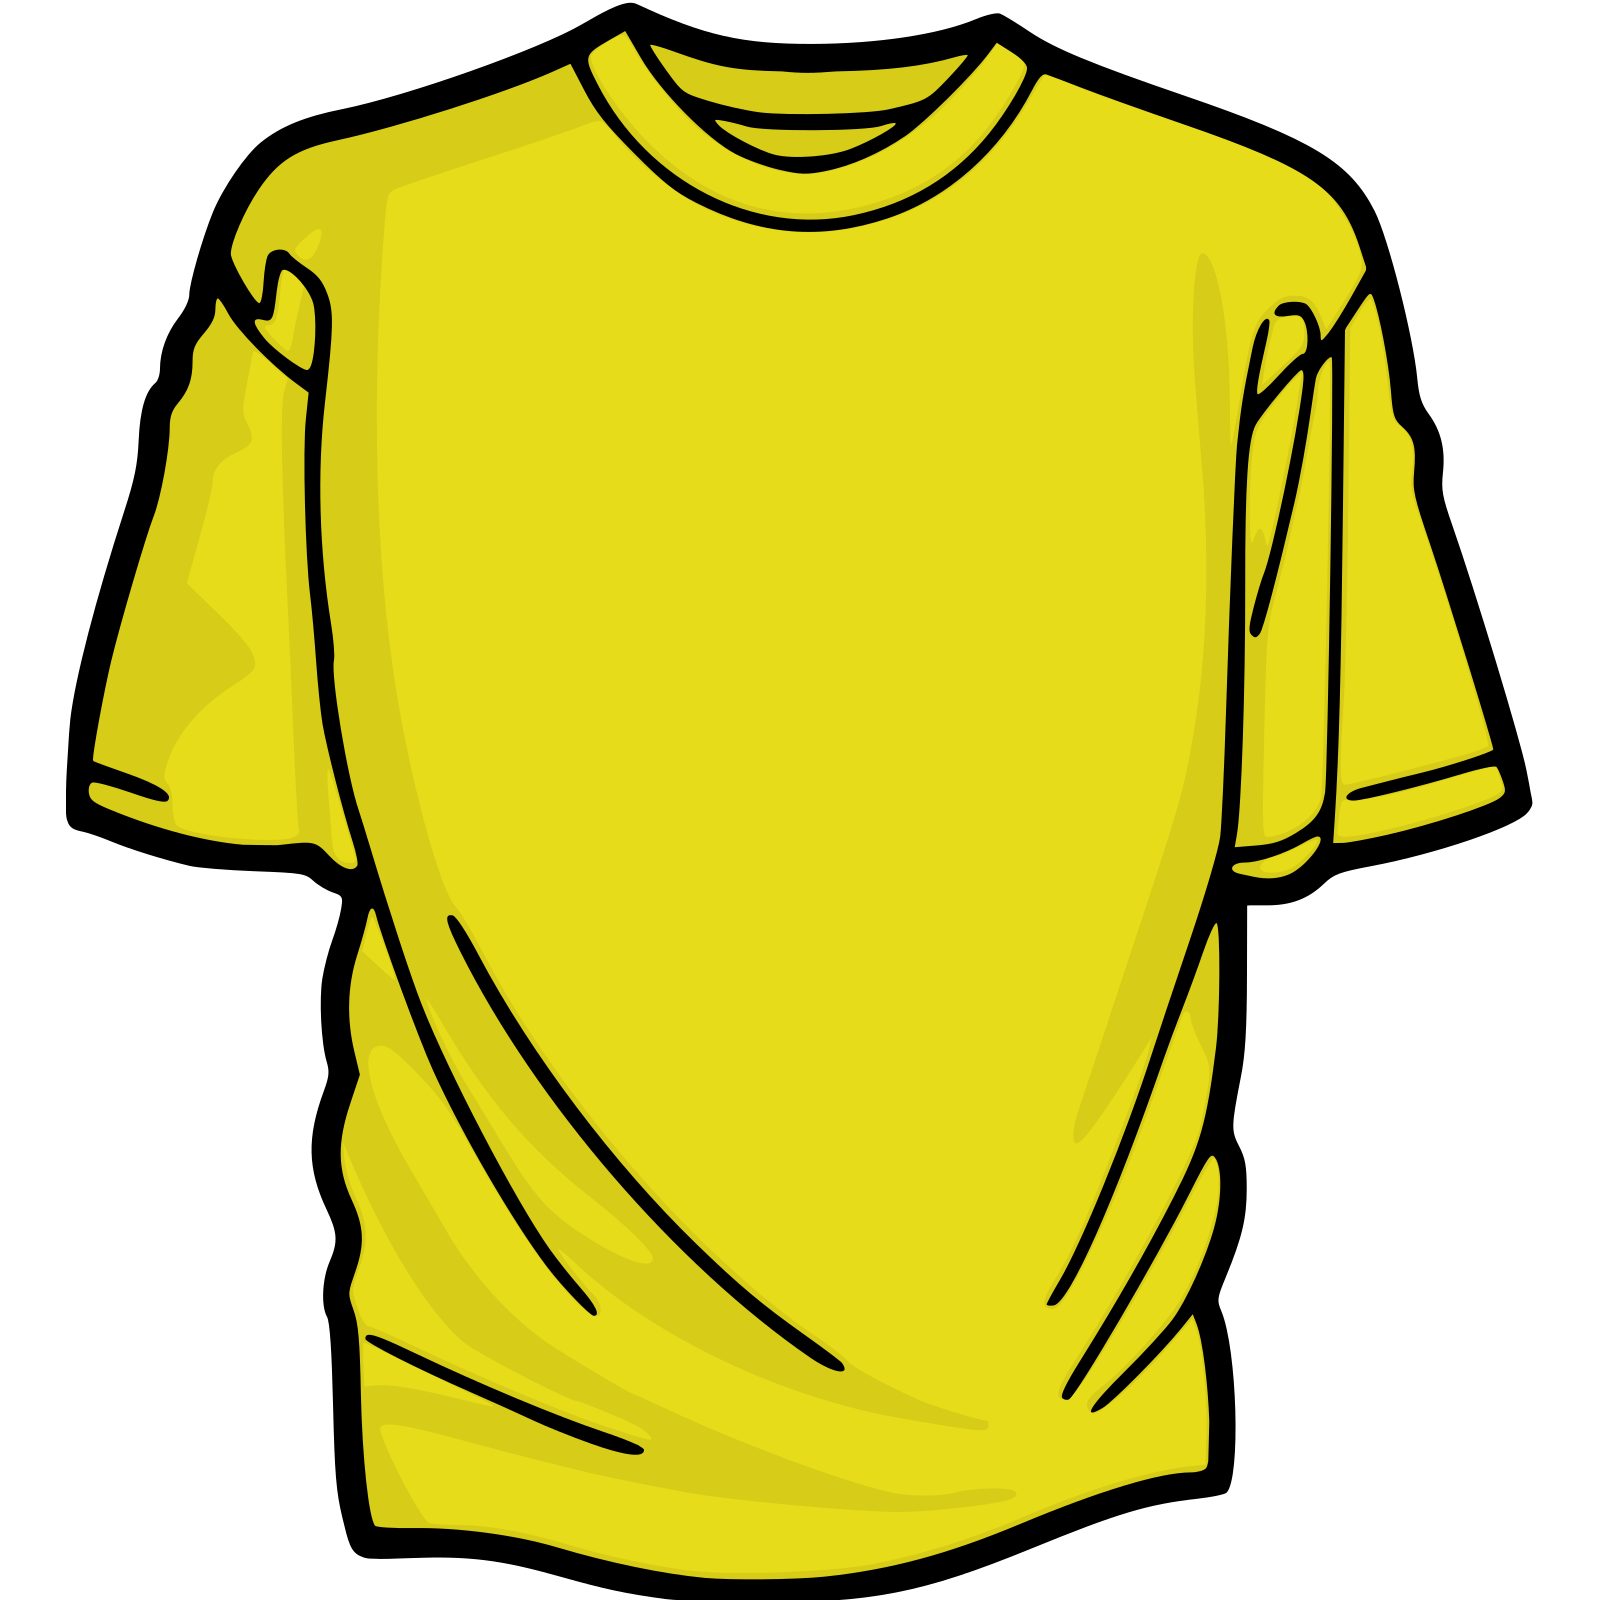 Light Green T - Green T Shirt Clipart, HD Png Download - kindpng